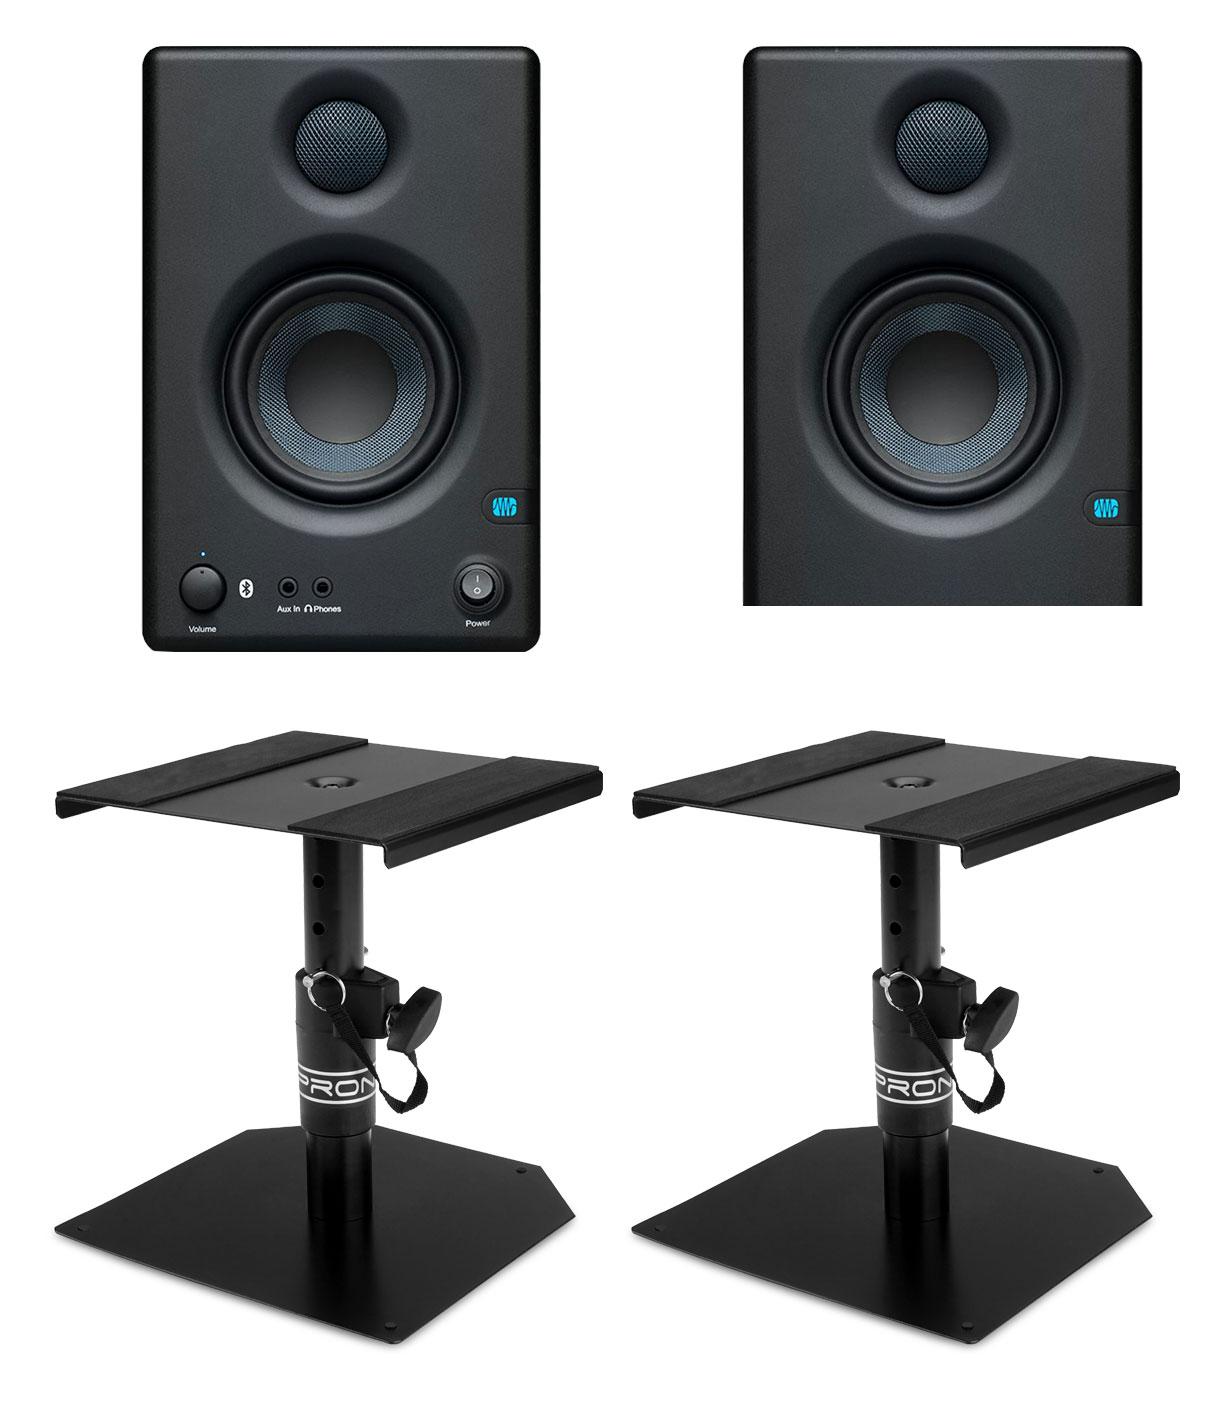 Studiomonitore - PreSonus Eris E3.5 BT Aktives Studiomonitor Set inkl. Boxenstativen - Onlineshop Musikhaus Kirstein